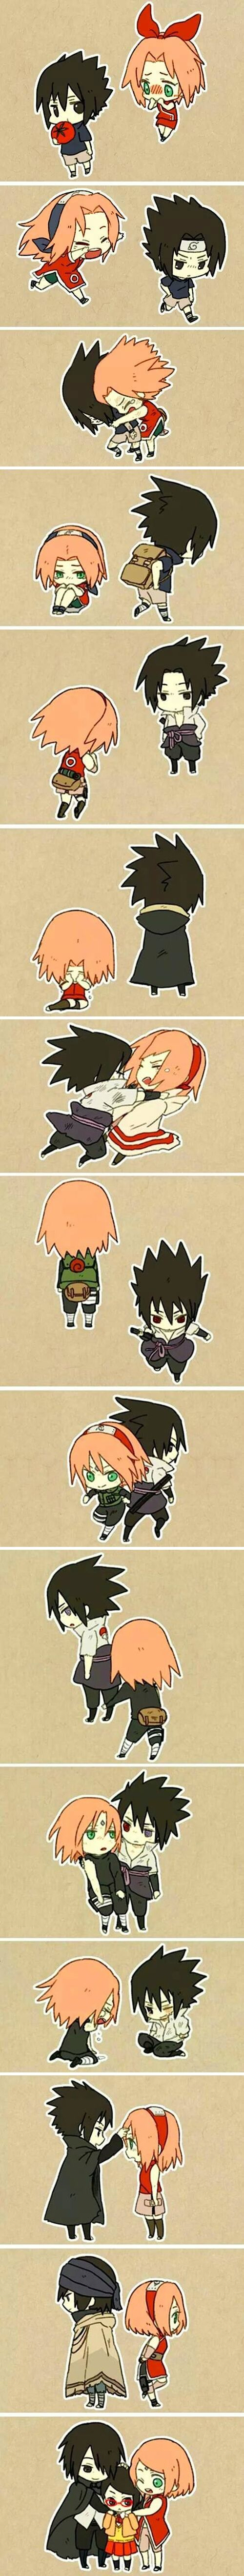 Sasuke and Sakura lindo casal